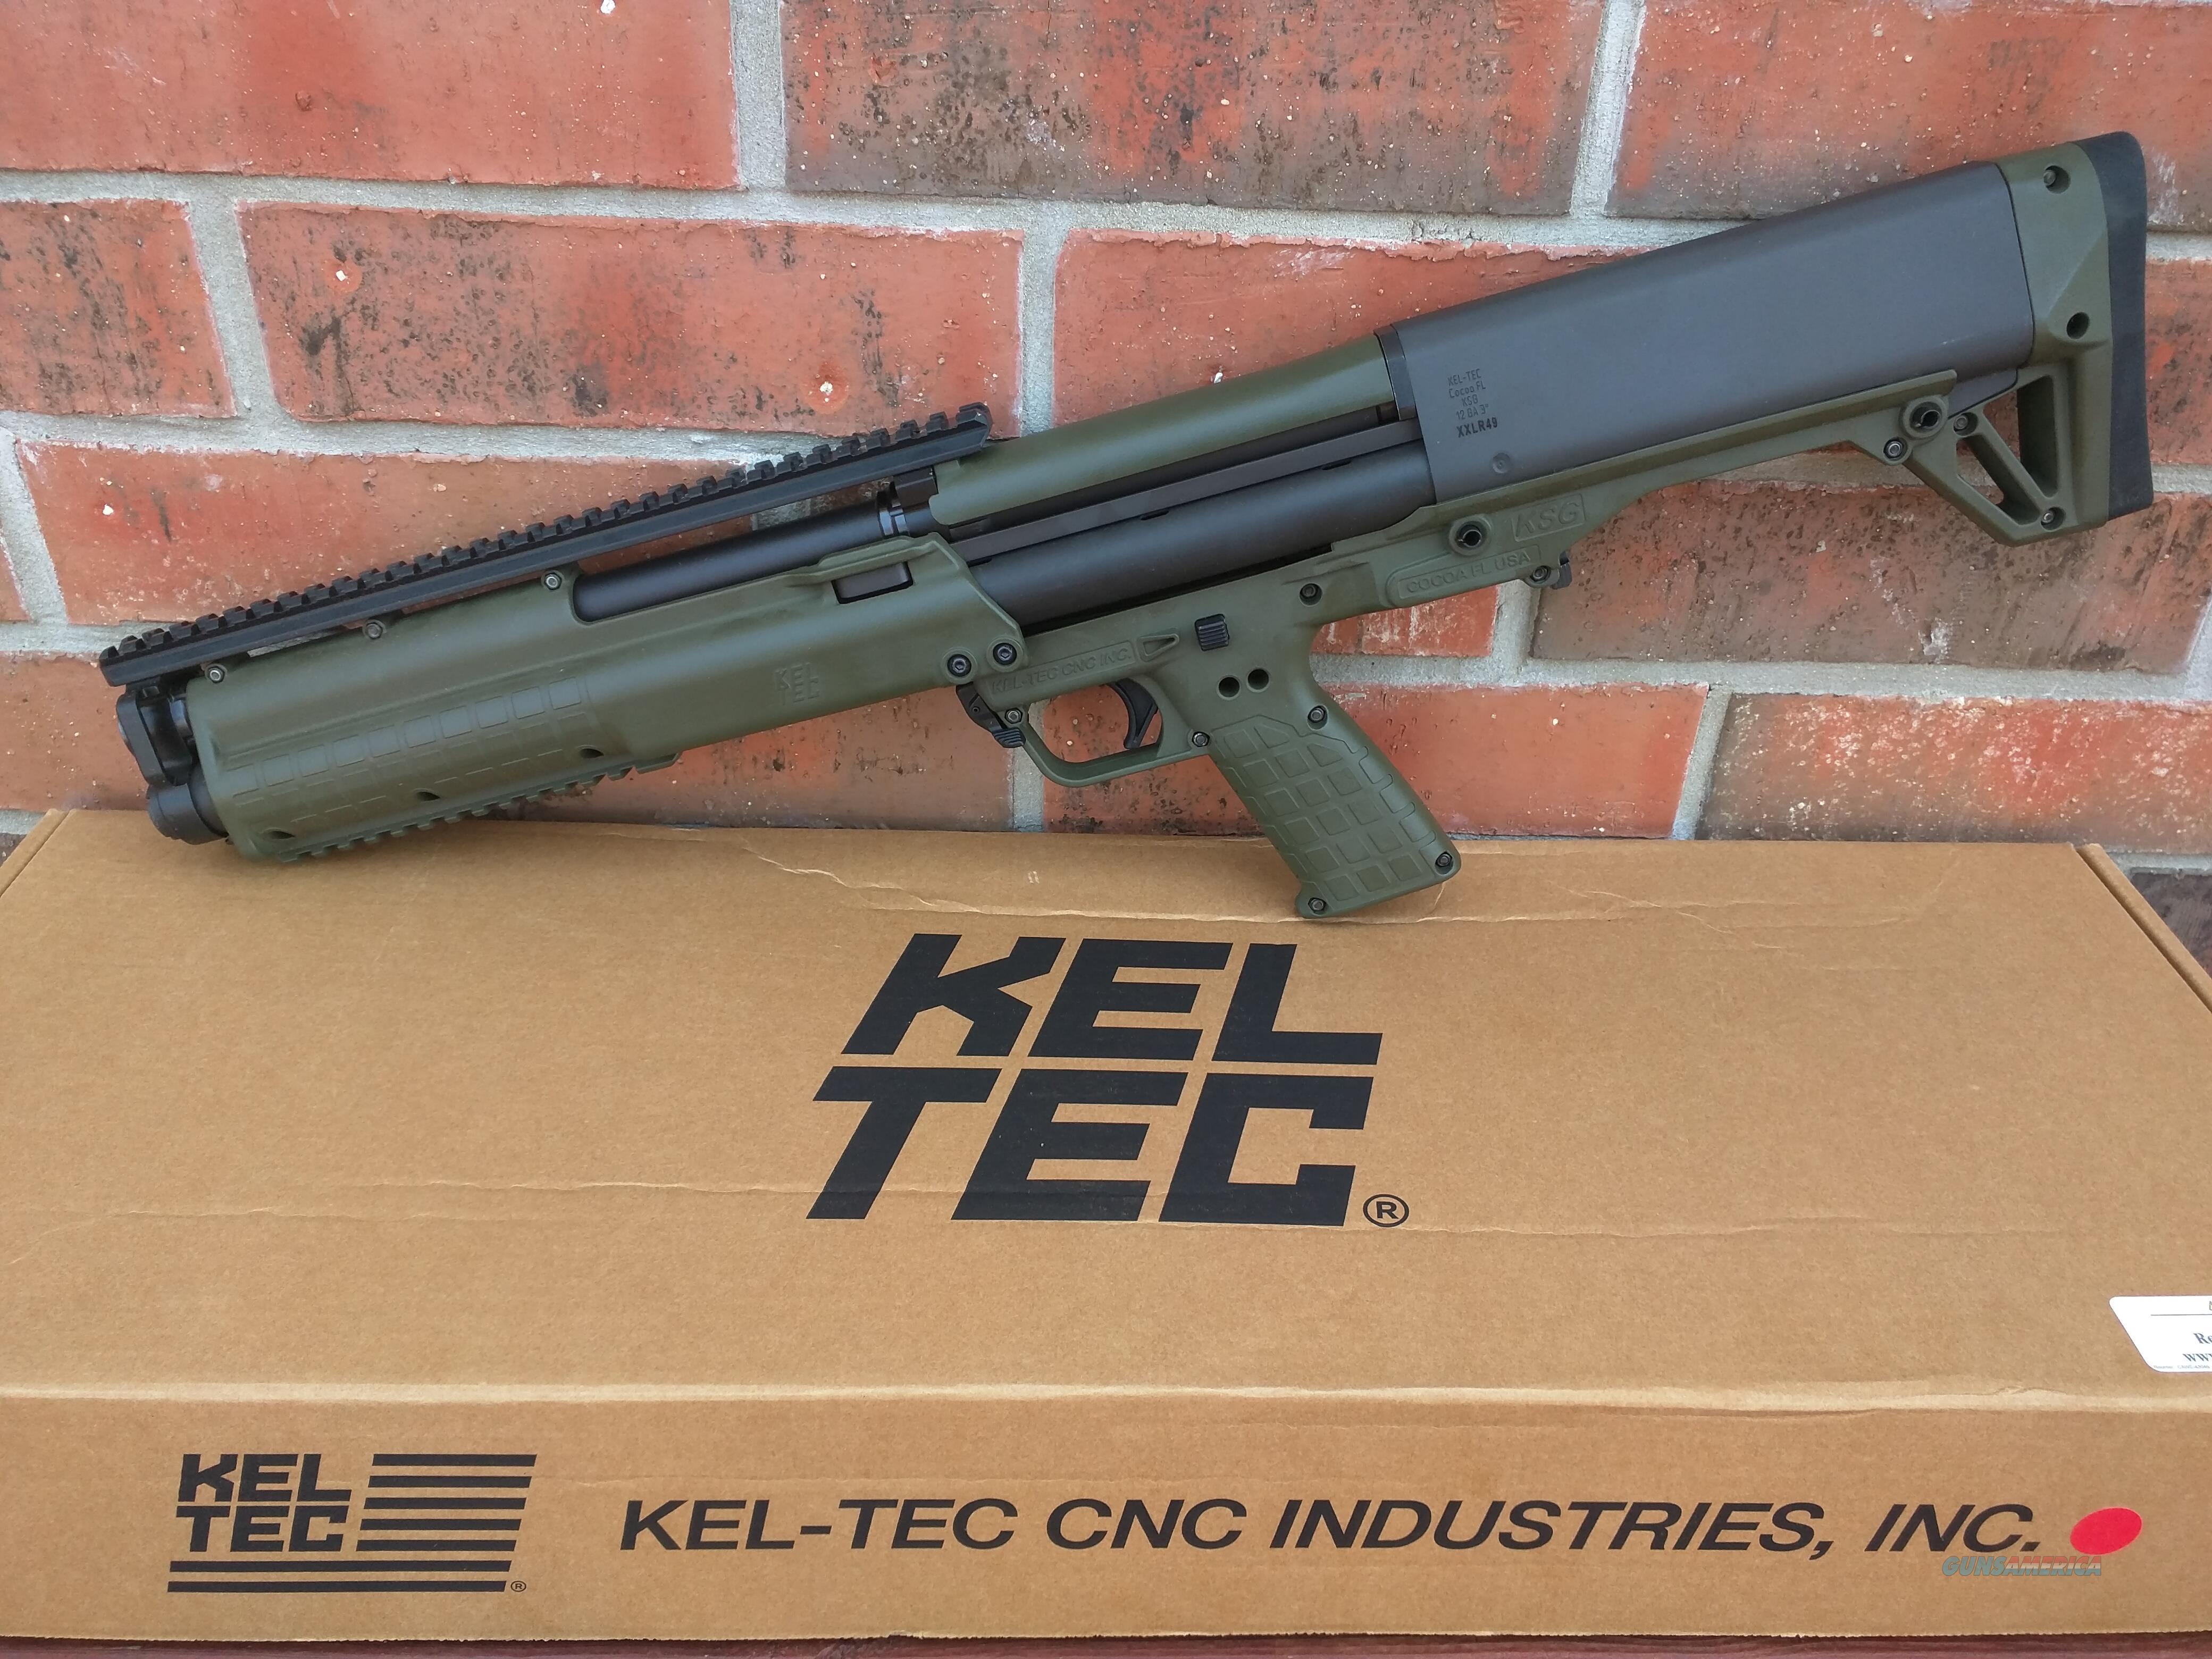 "Keltec KSG Green12 Gauge Pump 18.5"" 14+1 Capacity FREE LAYAWAY!! SALE!!  Guns > Shotguns > Kel-Tec Shotguns > KSG"